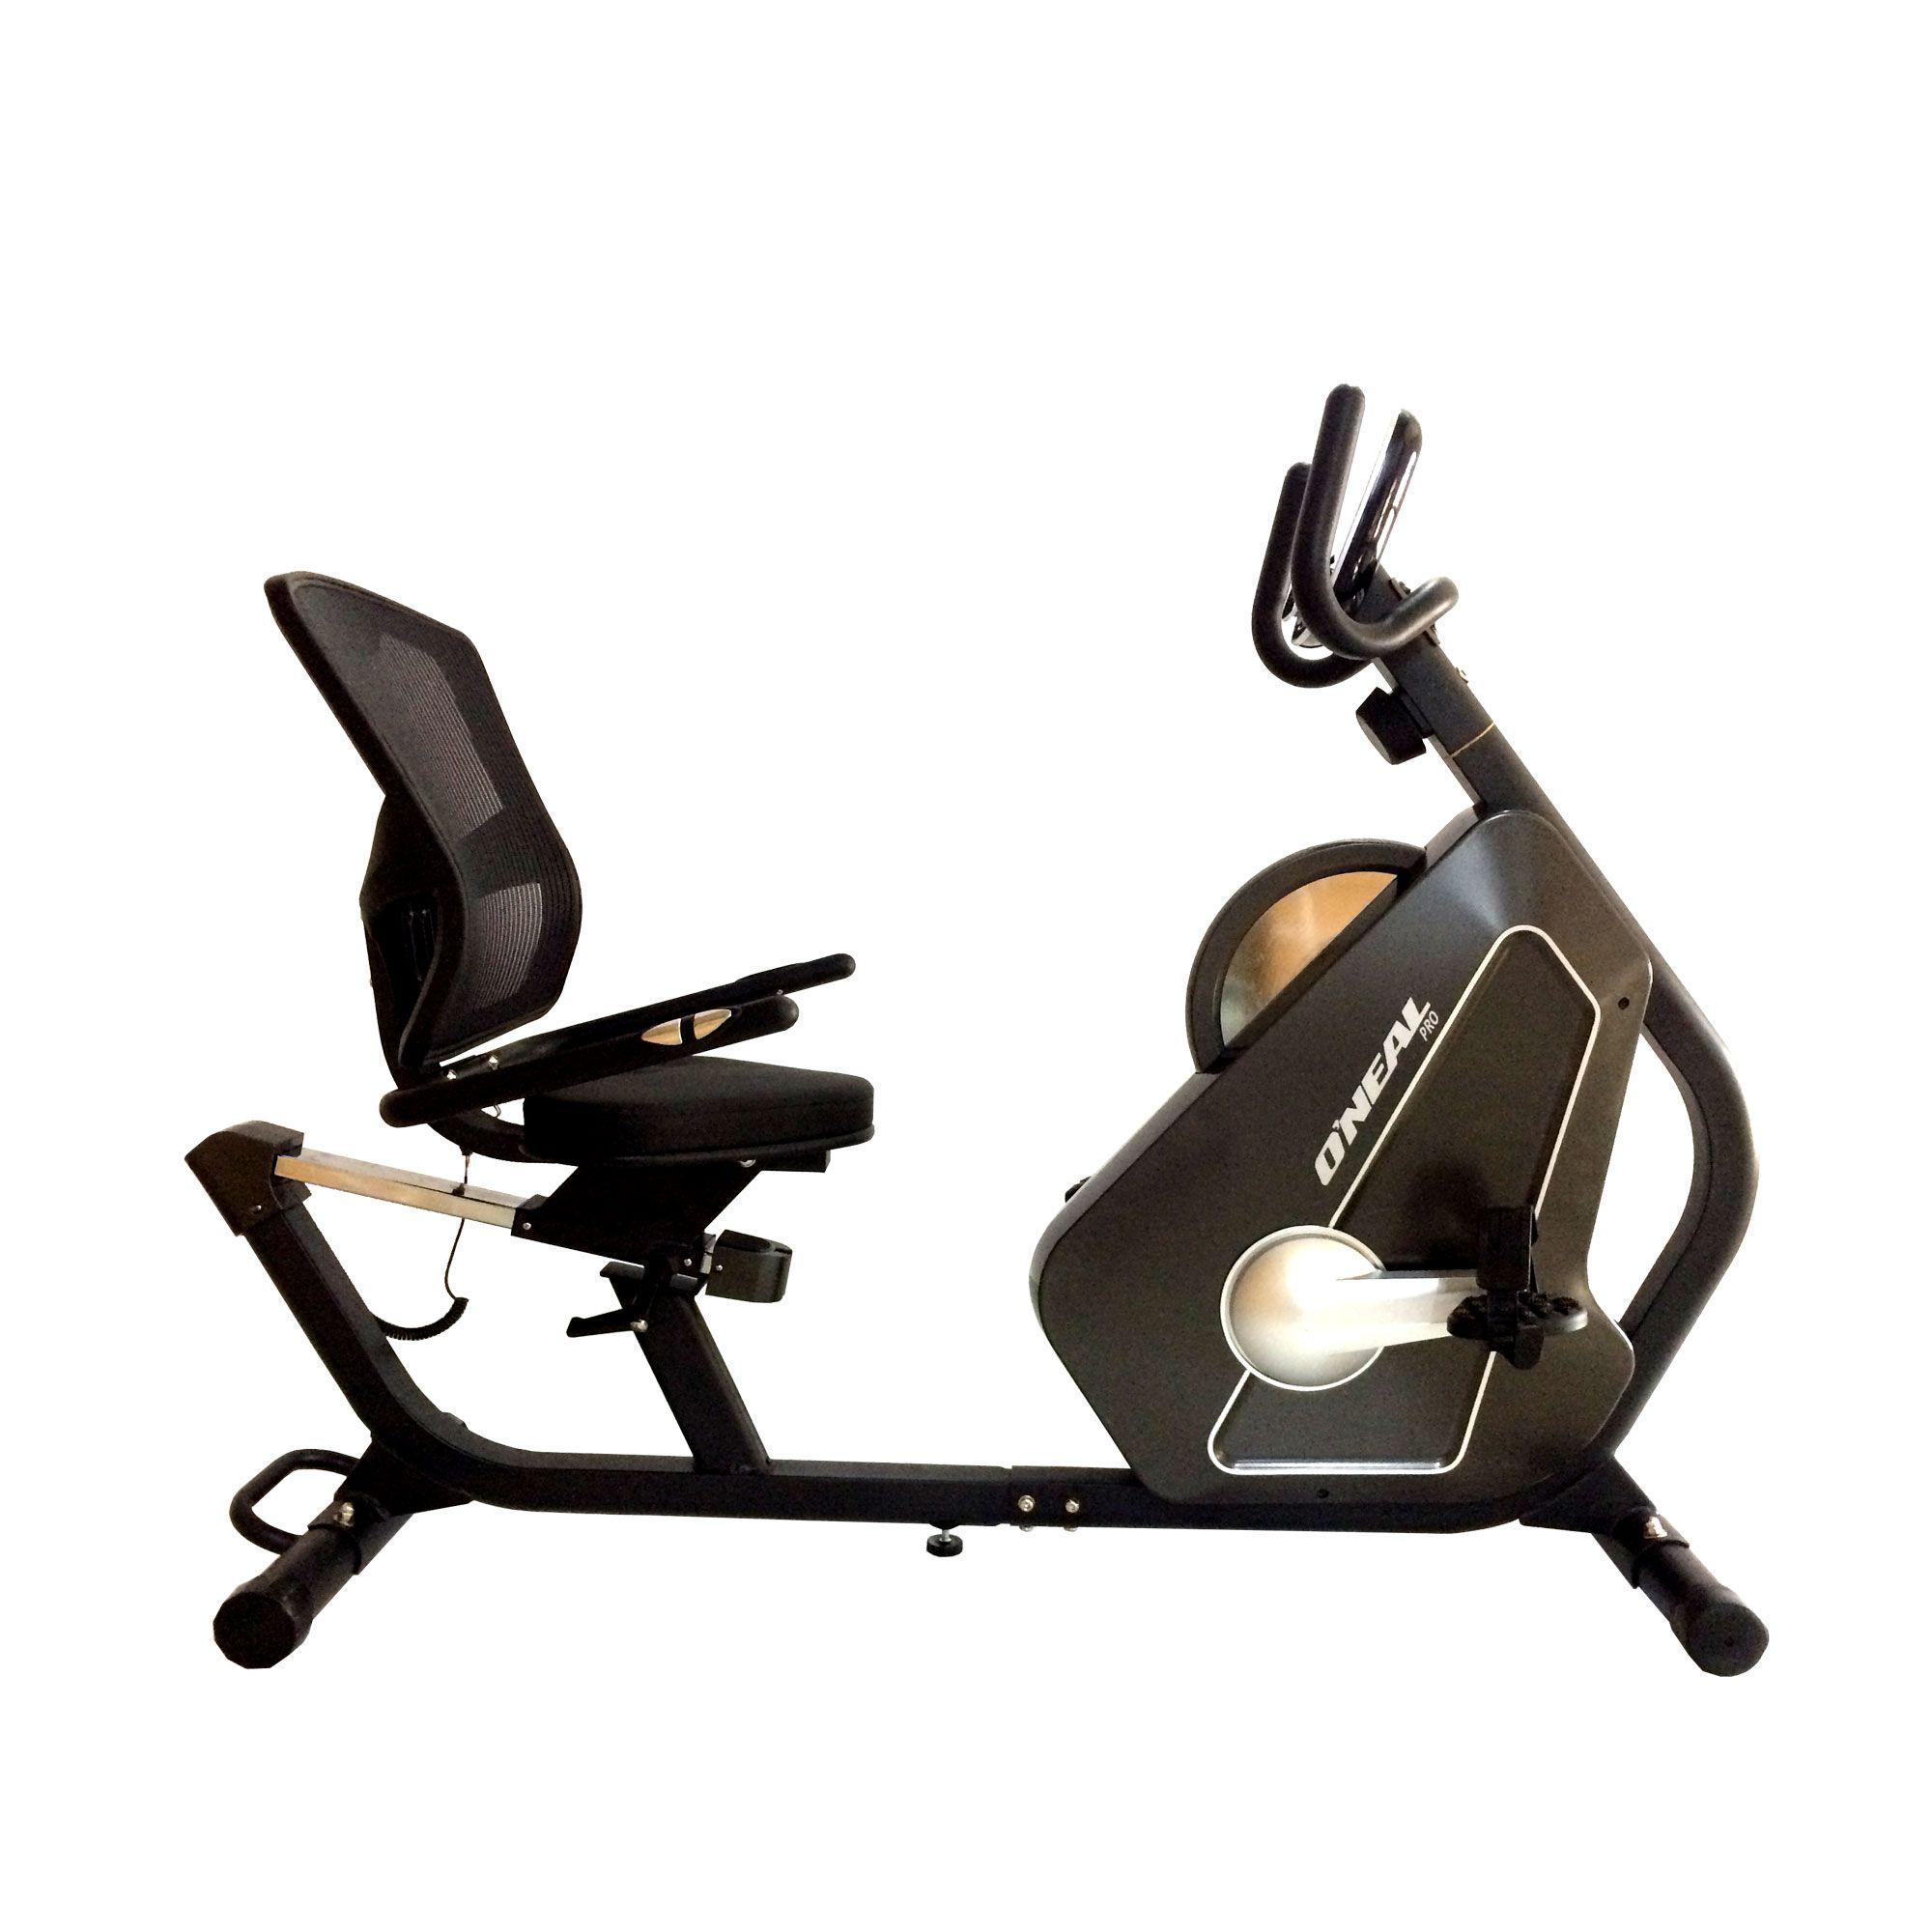 Bicicleta ergometrica horizontal semi-profissional 130kg tp720 oneal